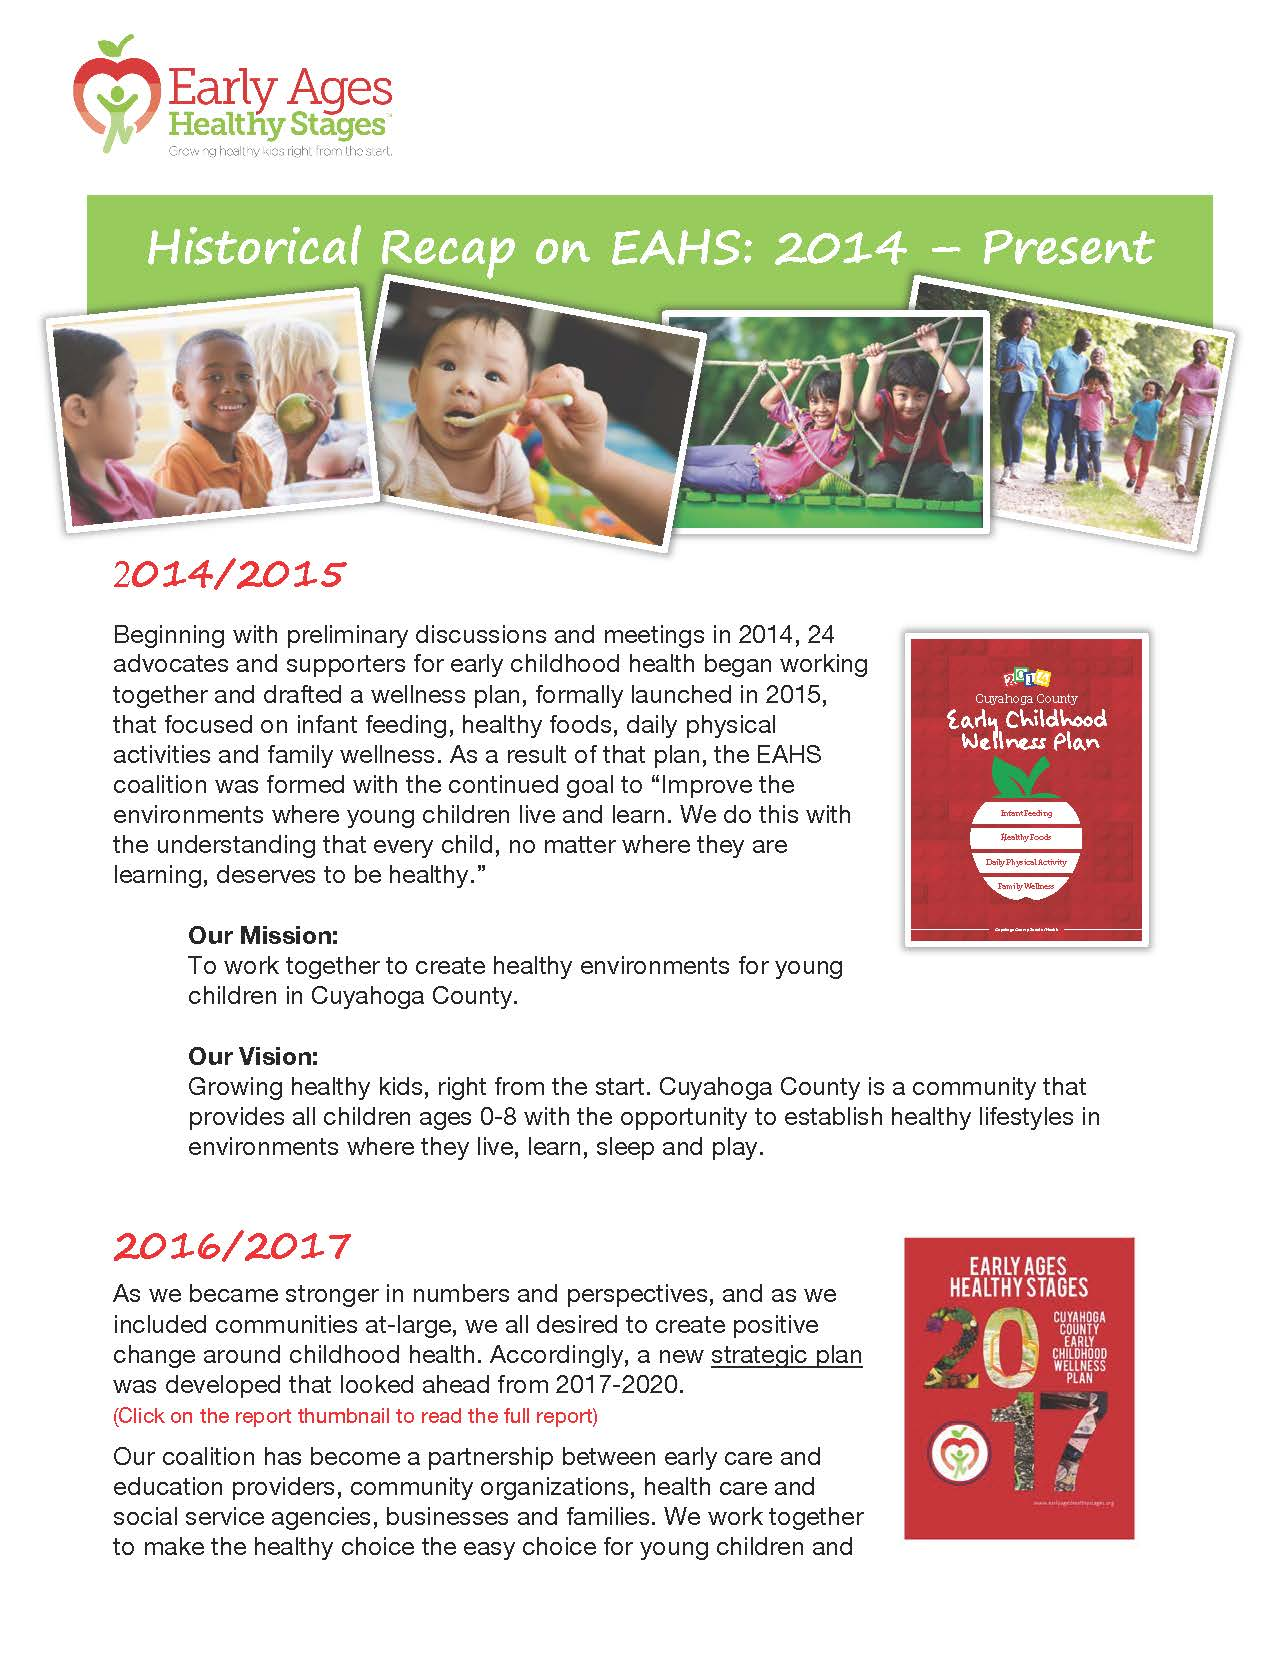 EAHS Historical Recap